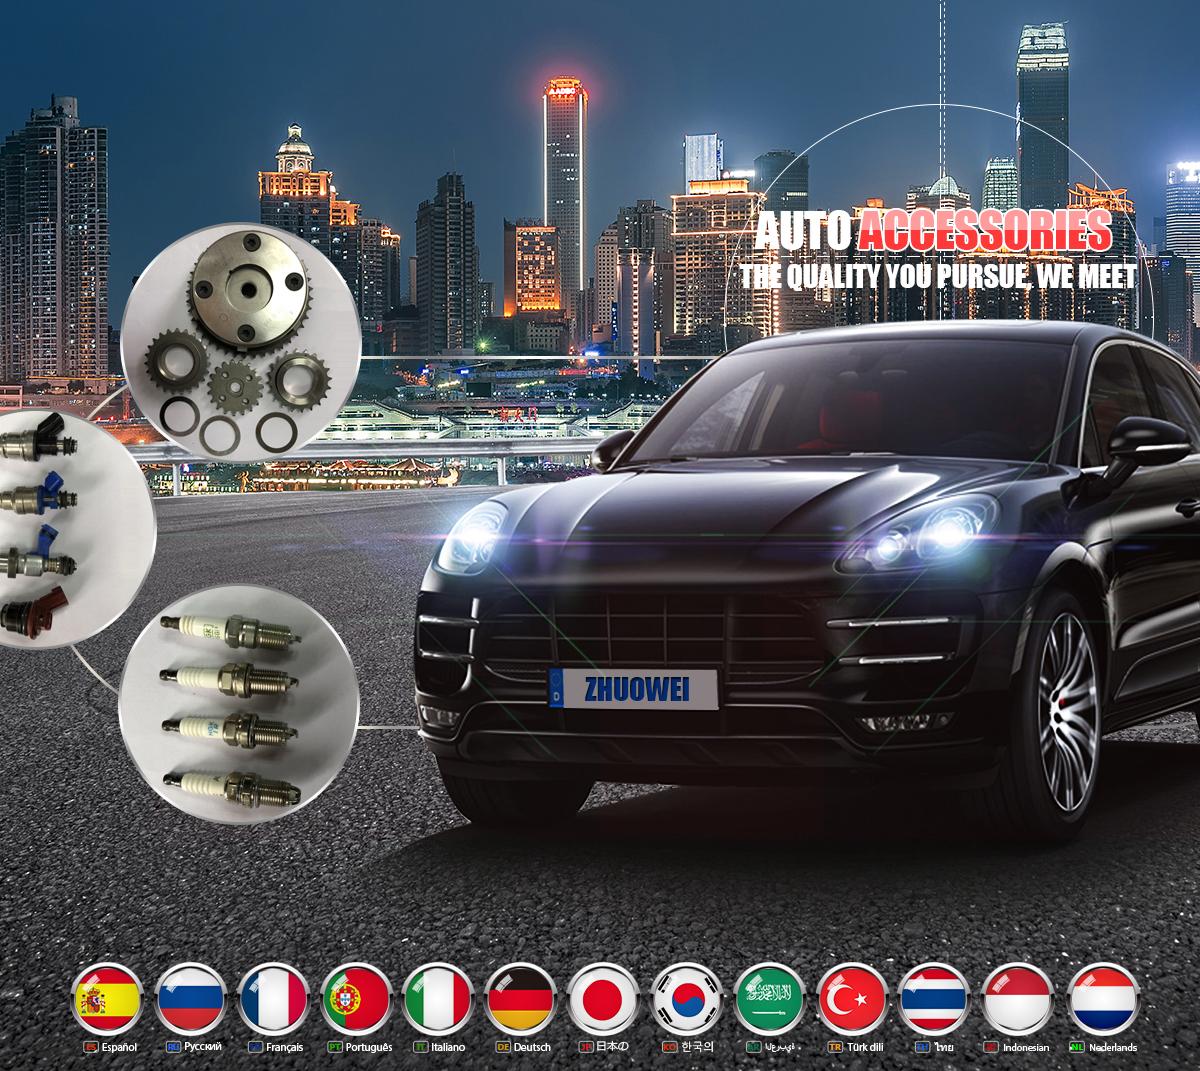 Guangzhou Zhuowei Auto Parts Co Ltd Ignition Coil Oil Filter Chevrolet Spin 1300 Cc Diesel